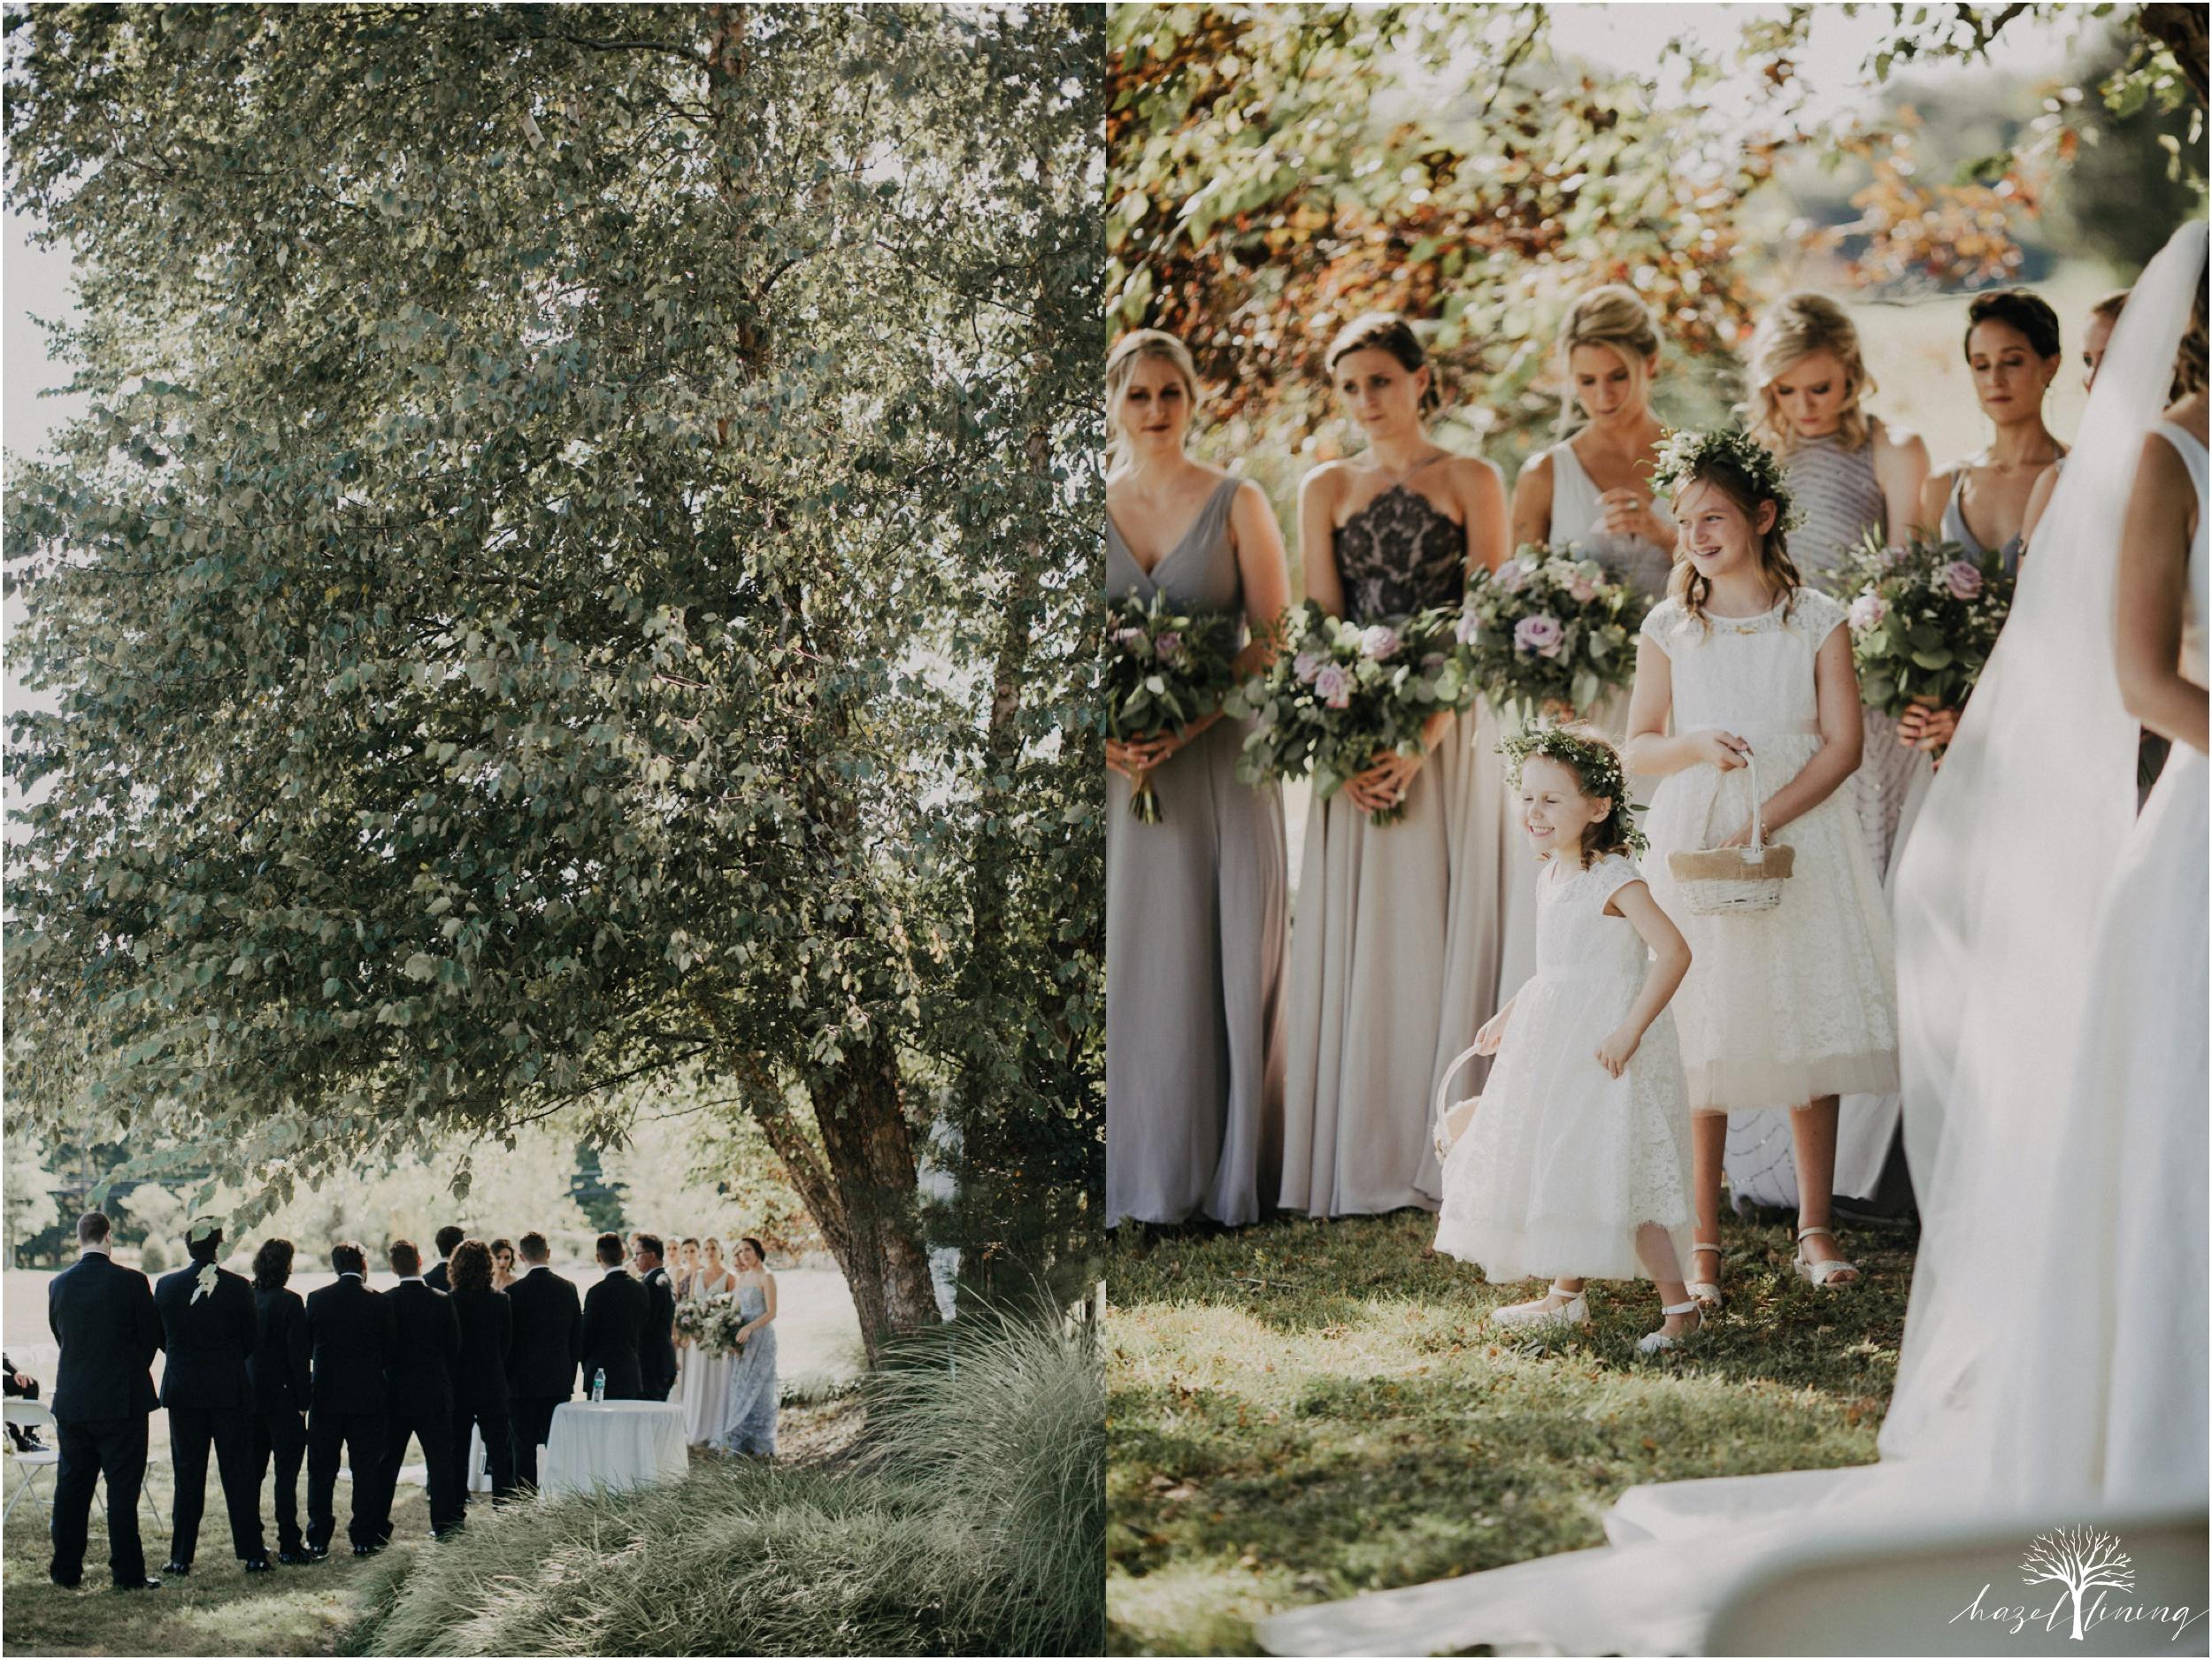 maureen-hepner-anthony-giordano-rose-bank-winery-newtow-pennsylvania-luxury-summer-wedding-hazel-lining-photography-destination-elopement-wedding-engagement-photography_0067.jpg